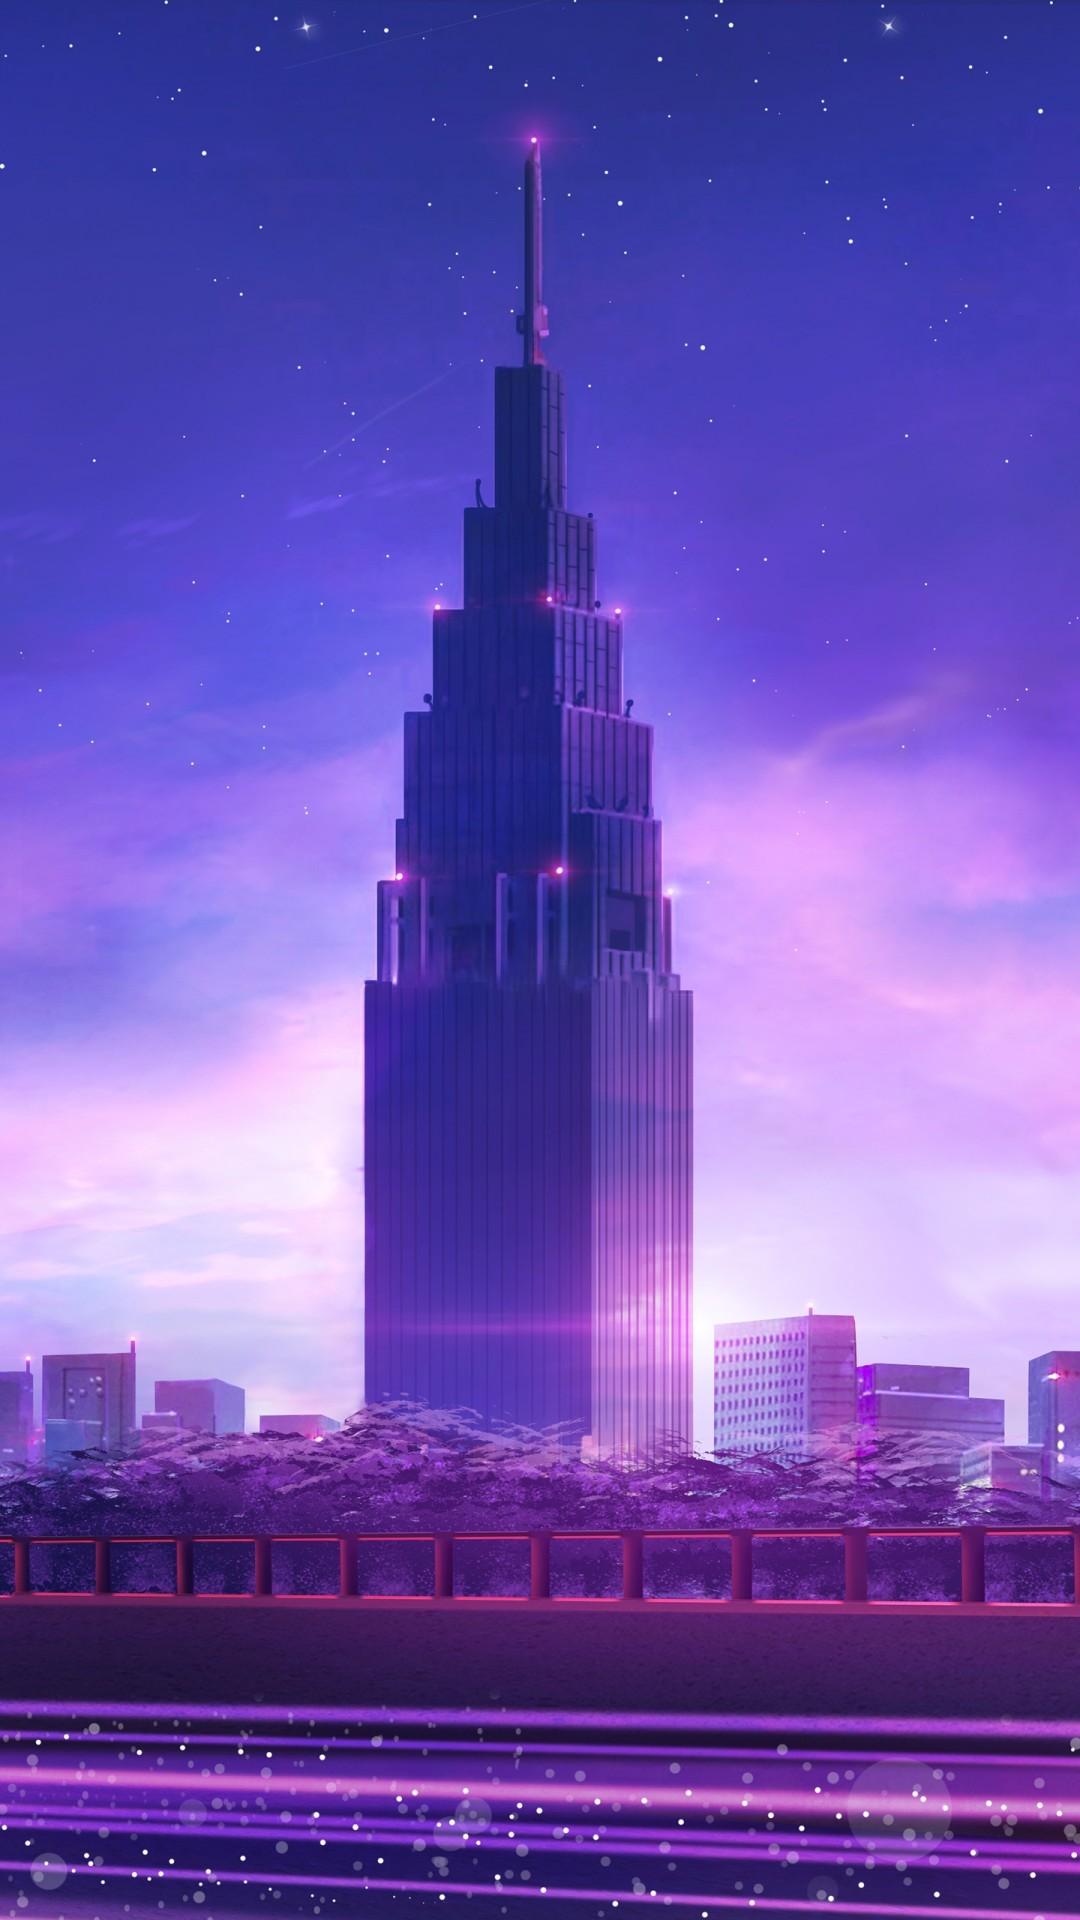 Free Cityscape phone wallpaper by xxxryanbarbeexxx